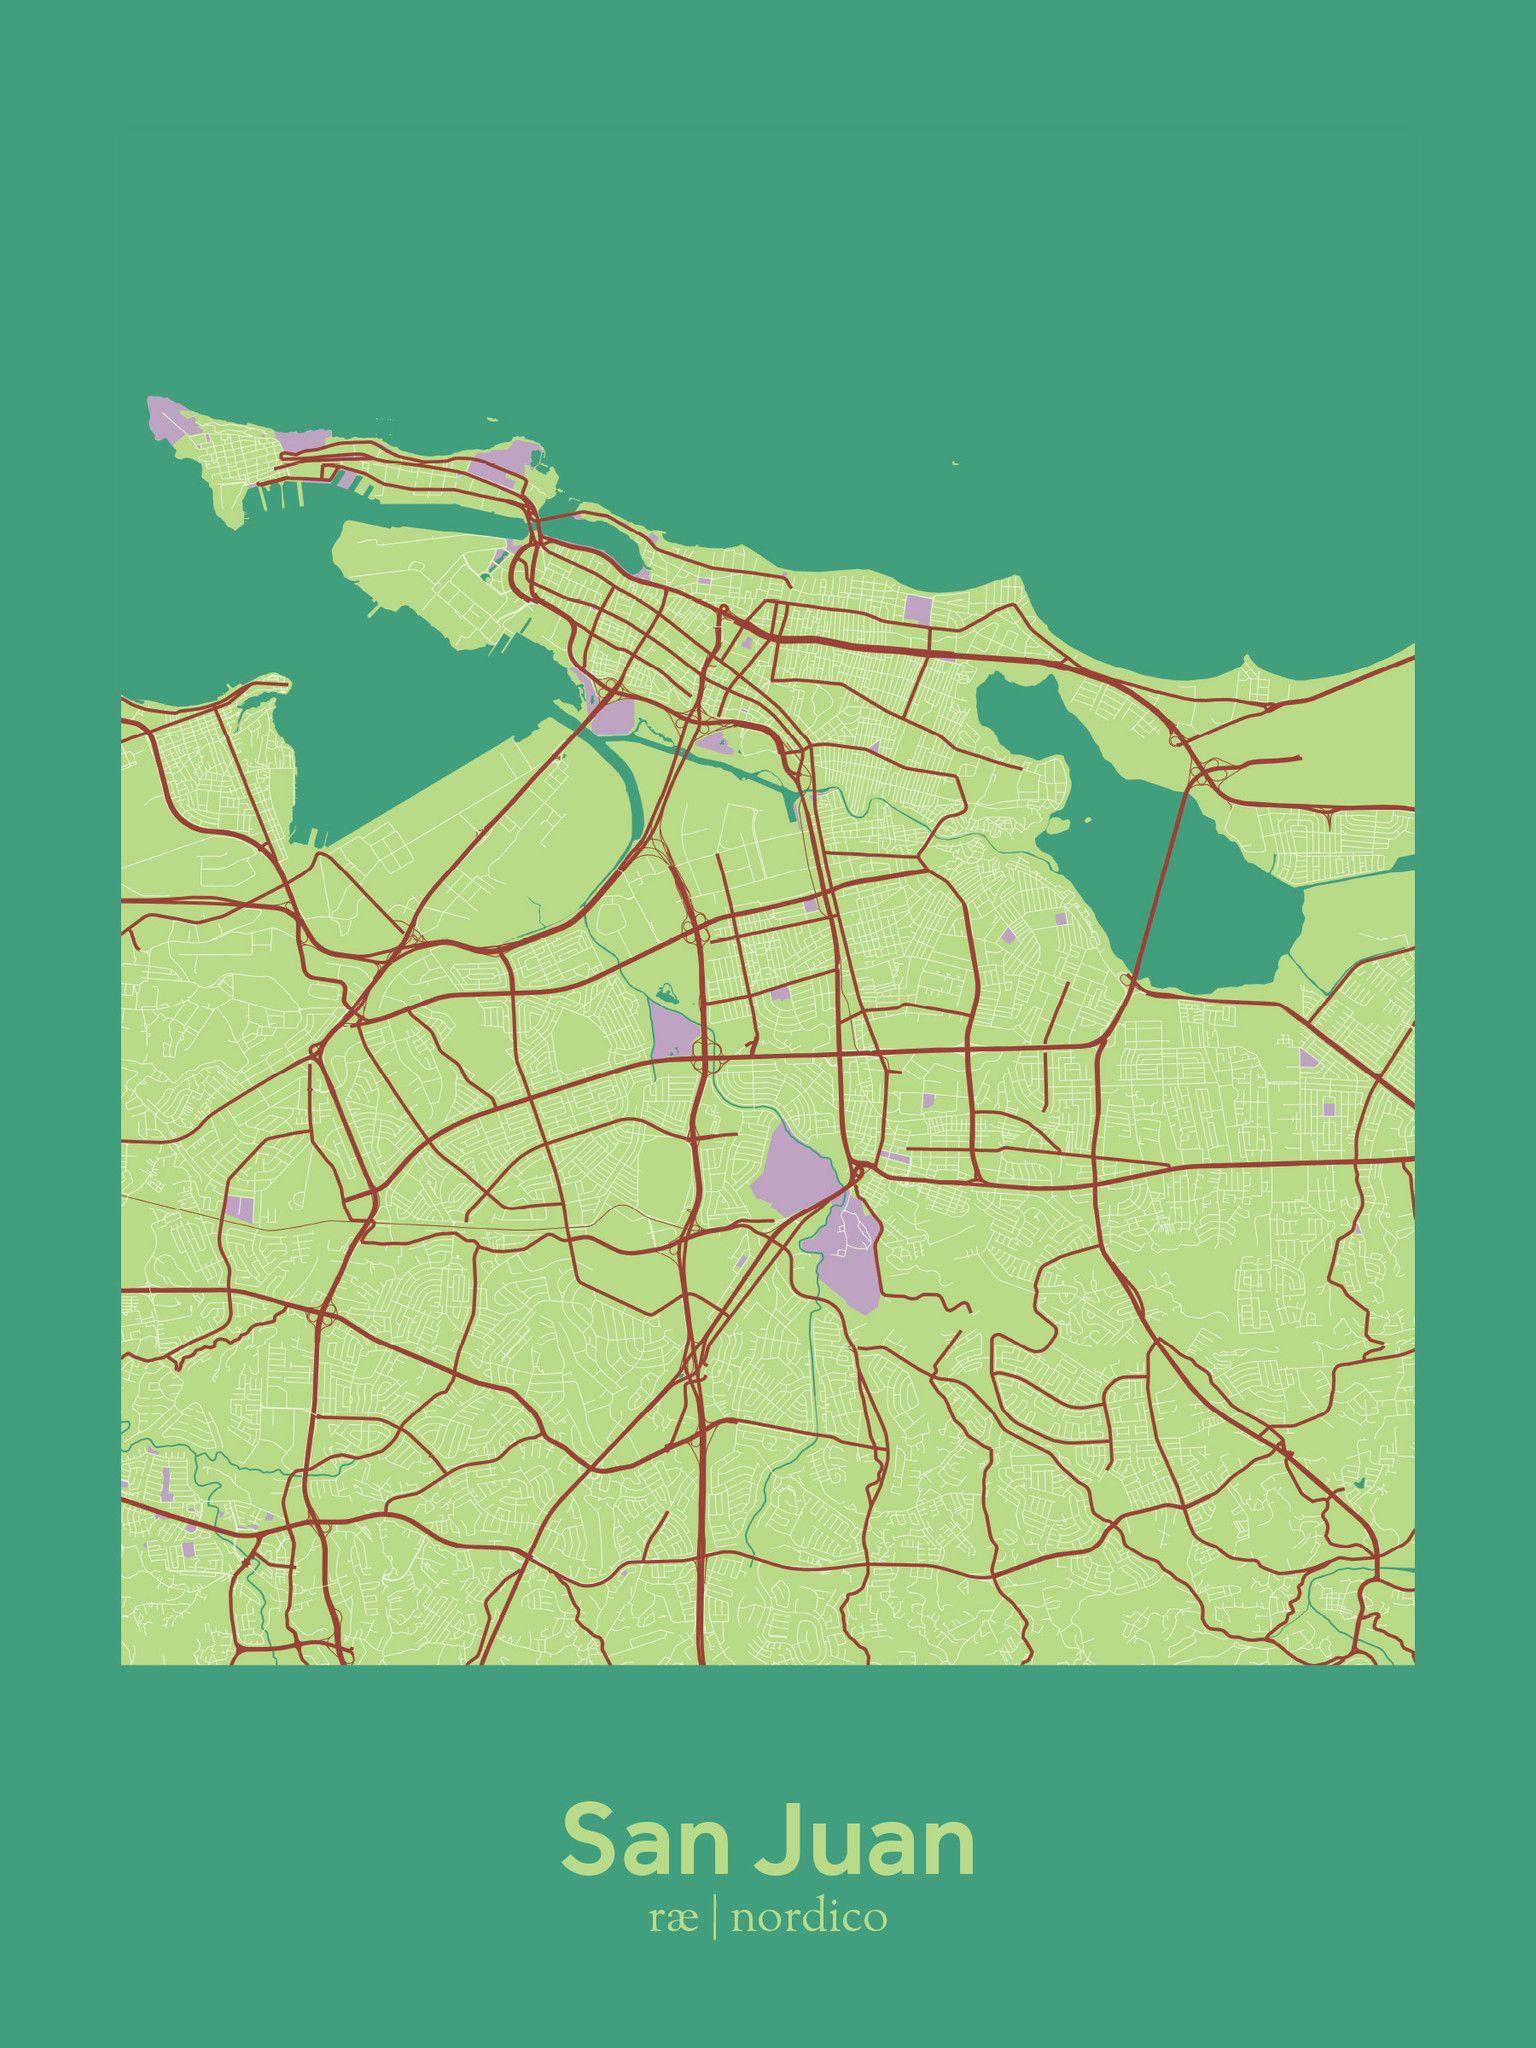 photo regarding Printable Maps of Puerto Rico titled San Juan, Puerto Rico Map Print Maps of Puerto Rico